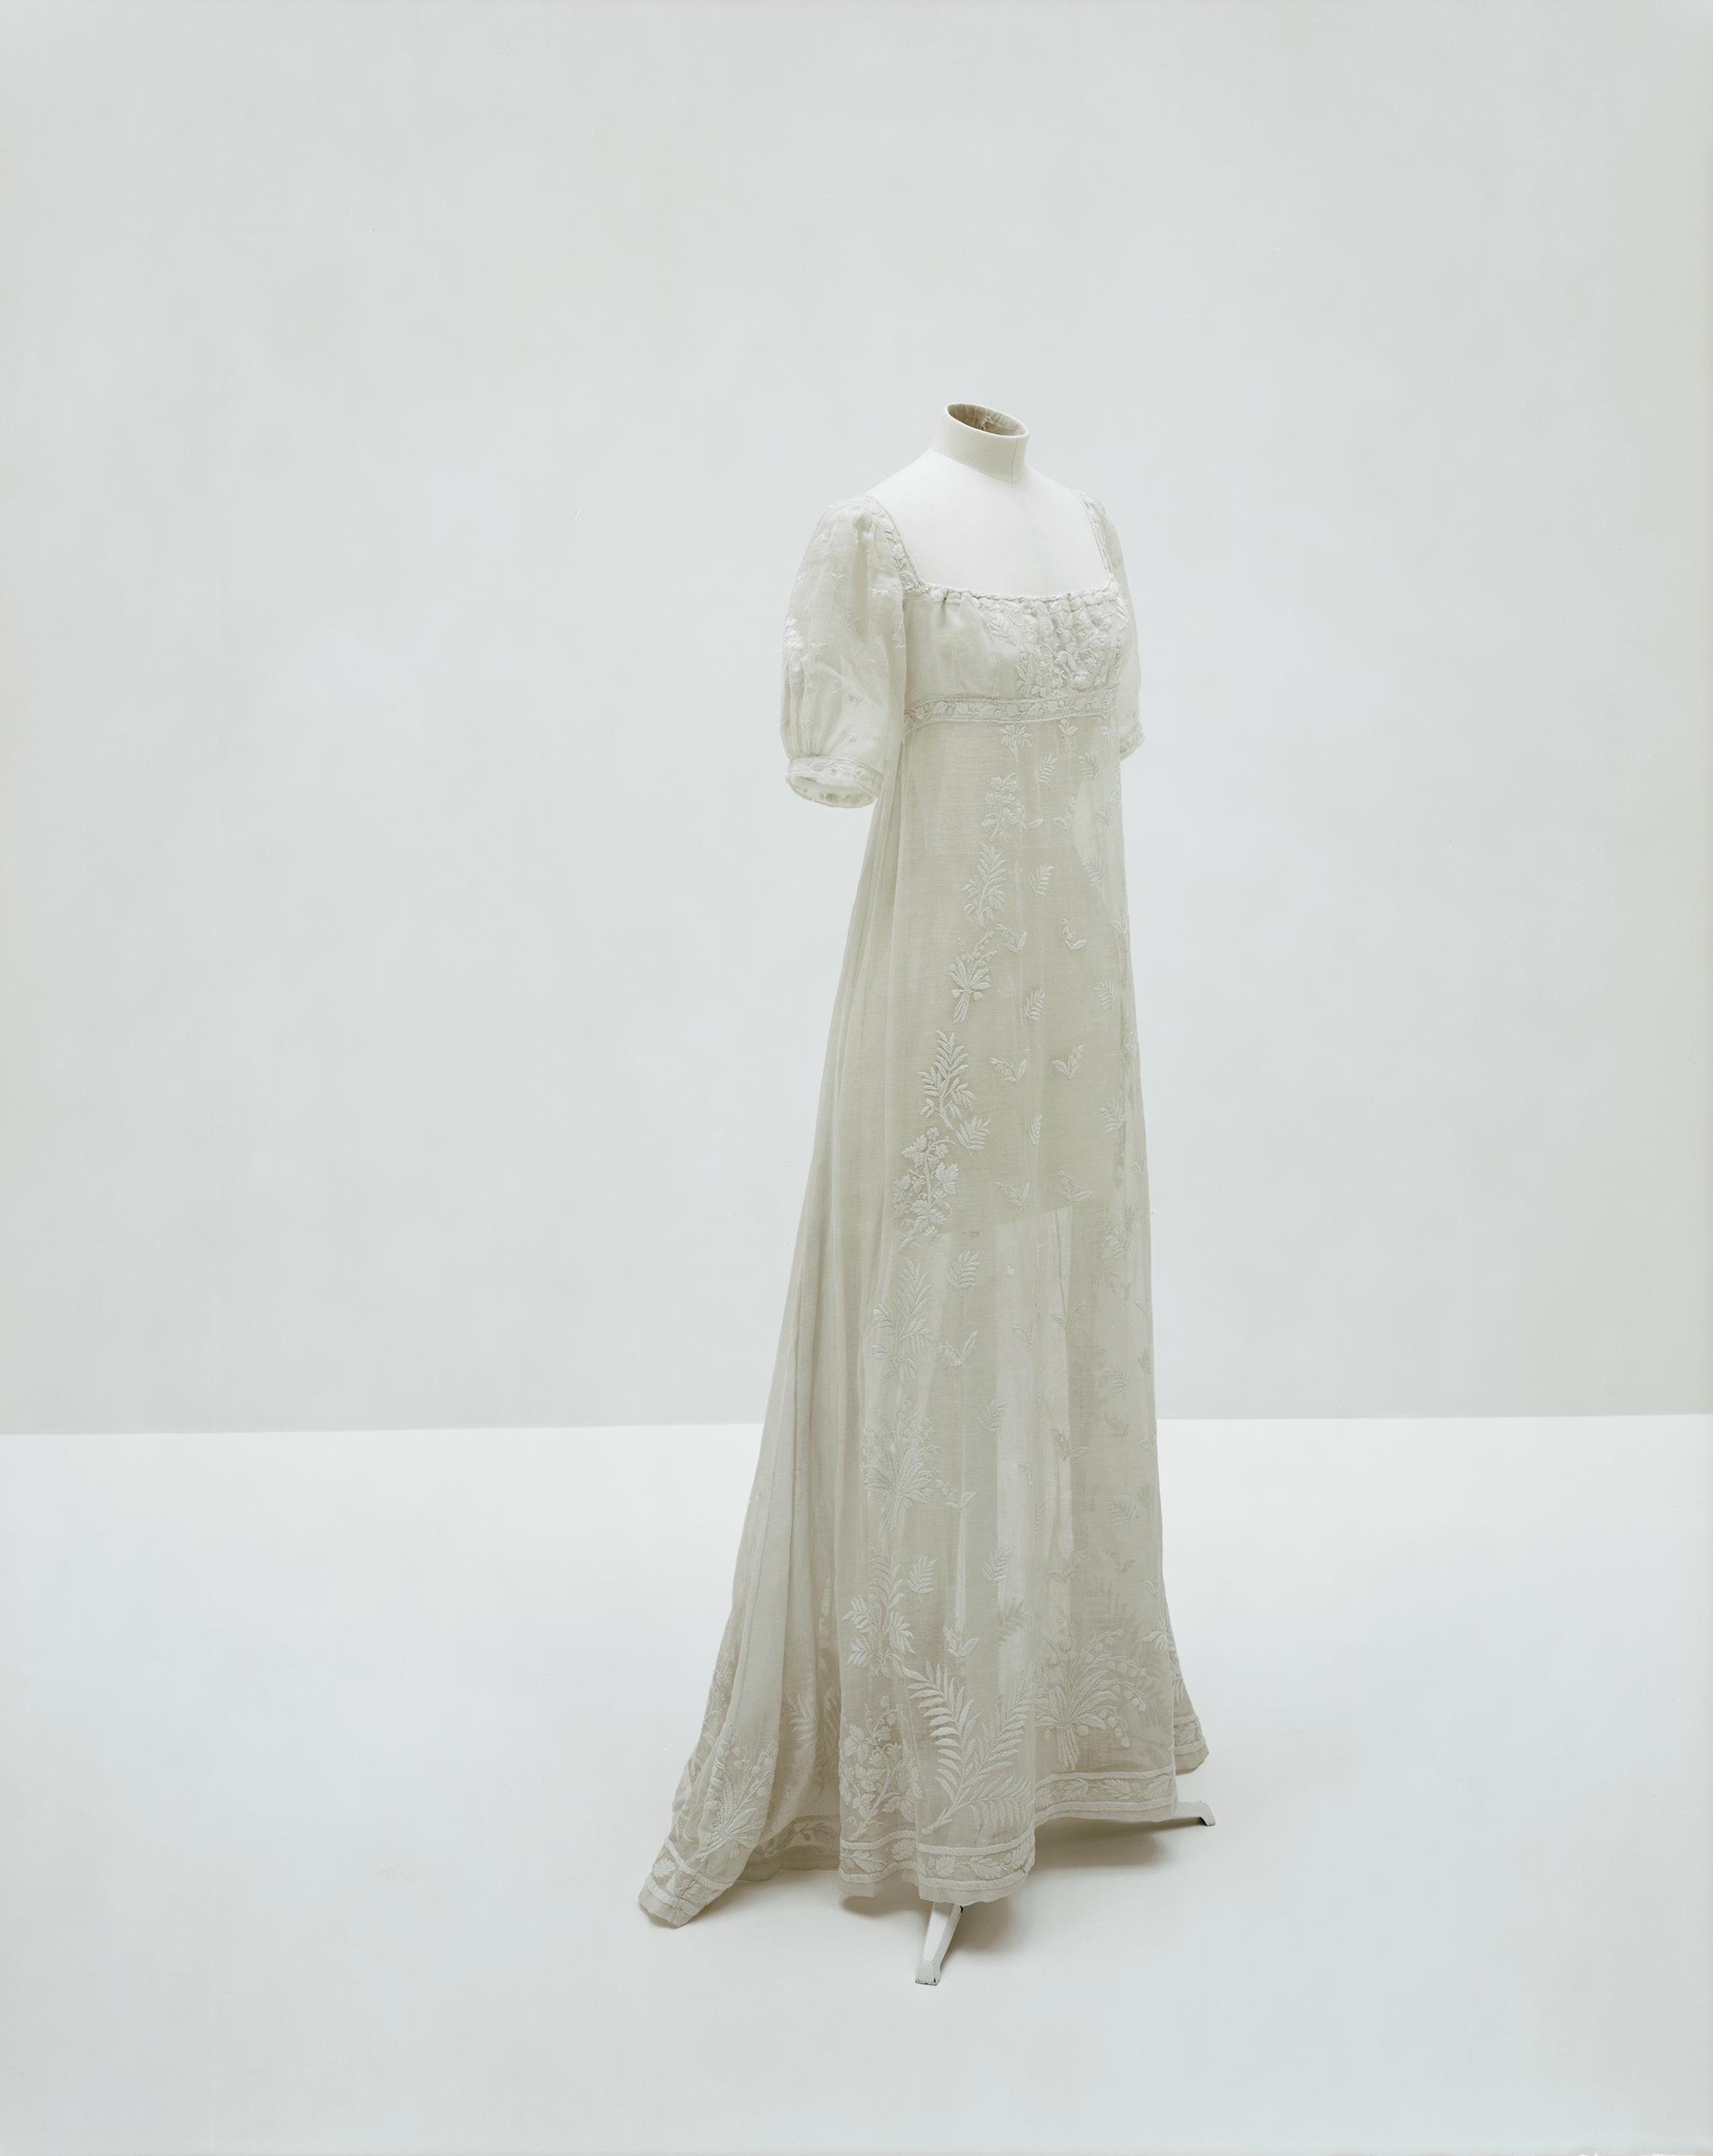 Dress worn by Empress Joséphine